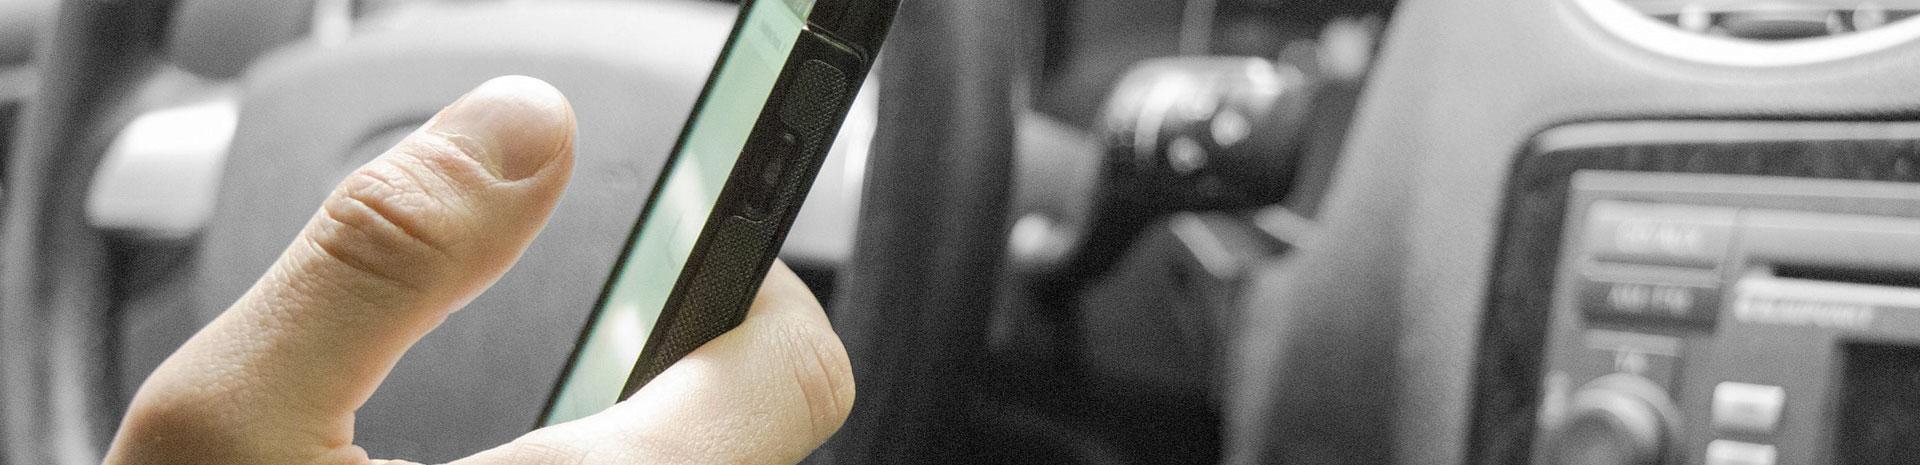 Cameracontrole tegen smartphonegebruik in de auto | LetselPro